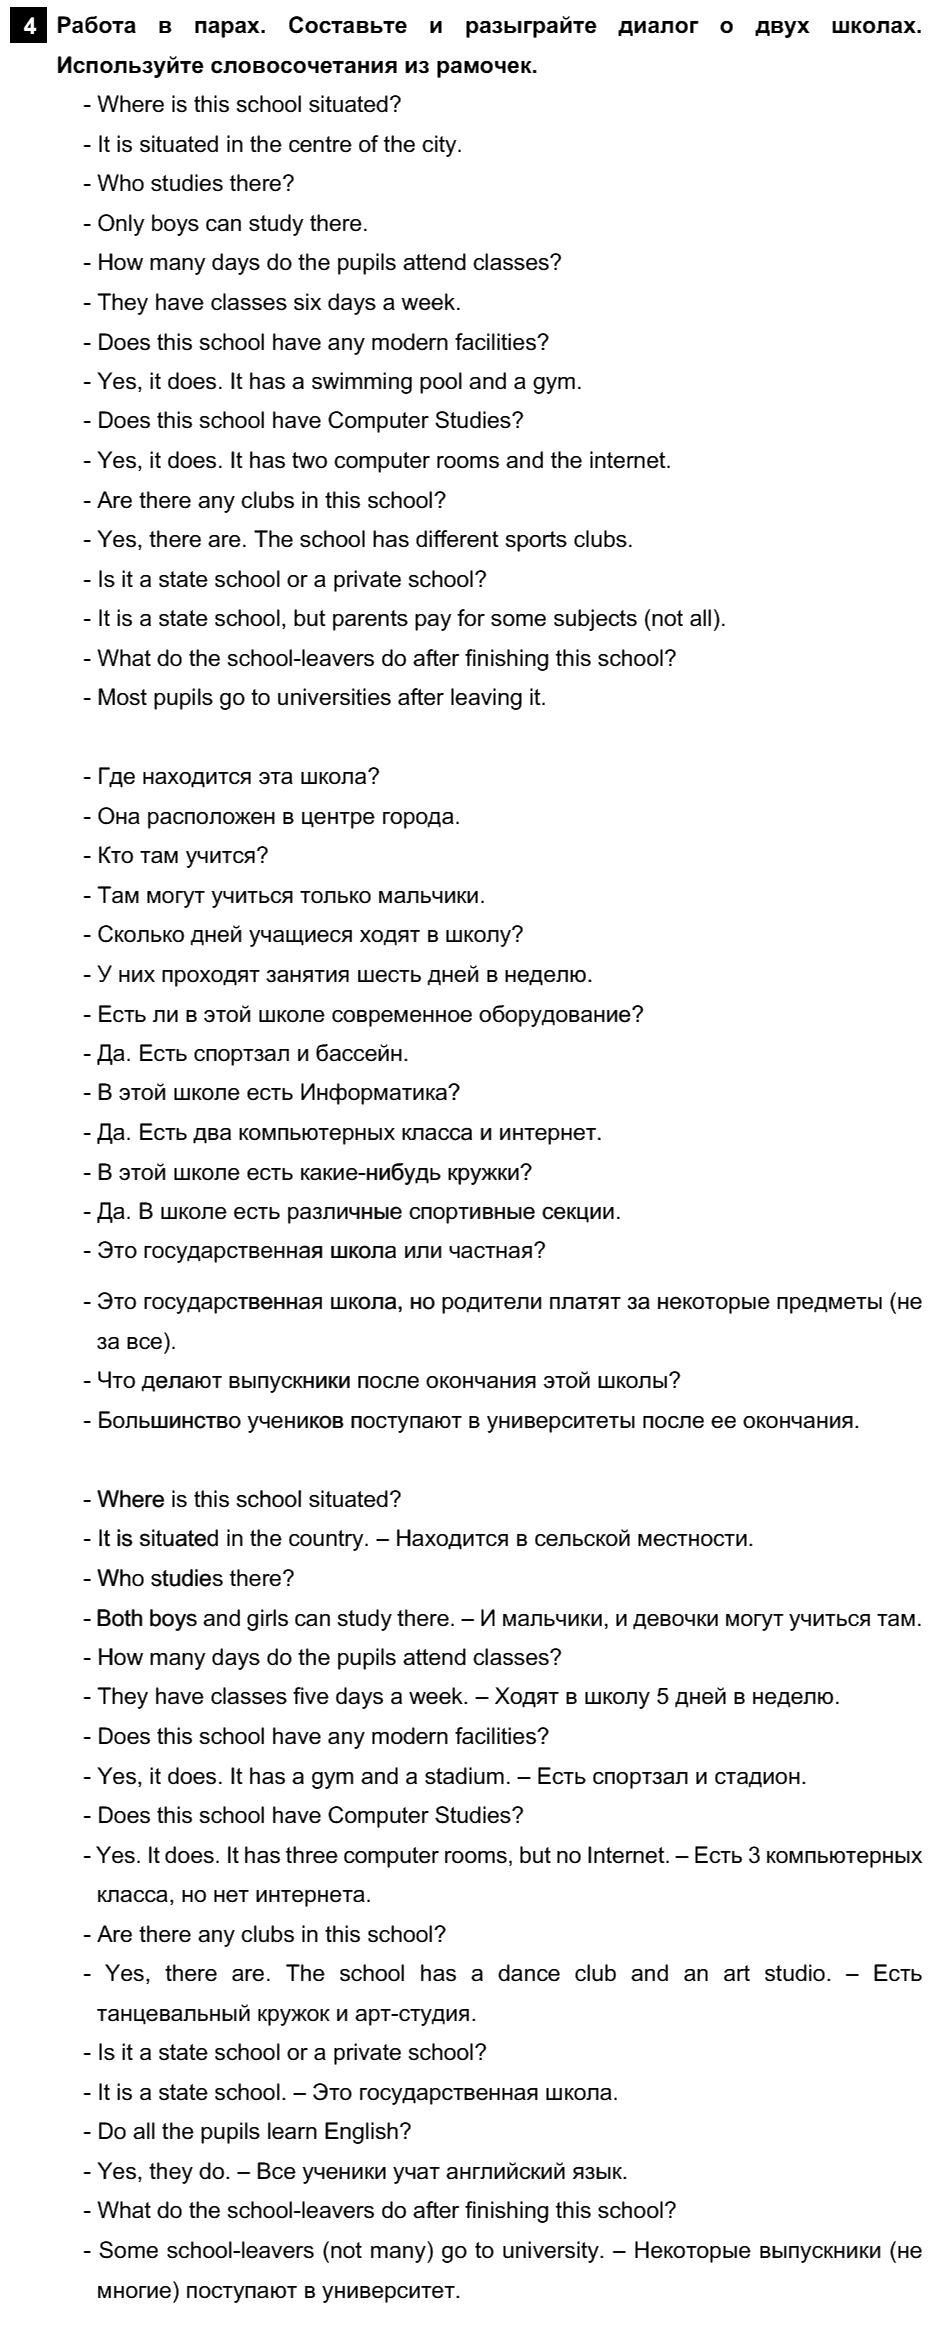 Английский язык 7 класс Афанасьева О. В. Unit 1. Школа и учёба / Шаг 9: 4